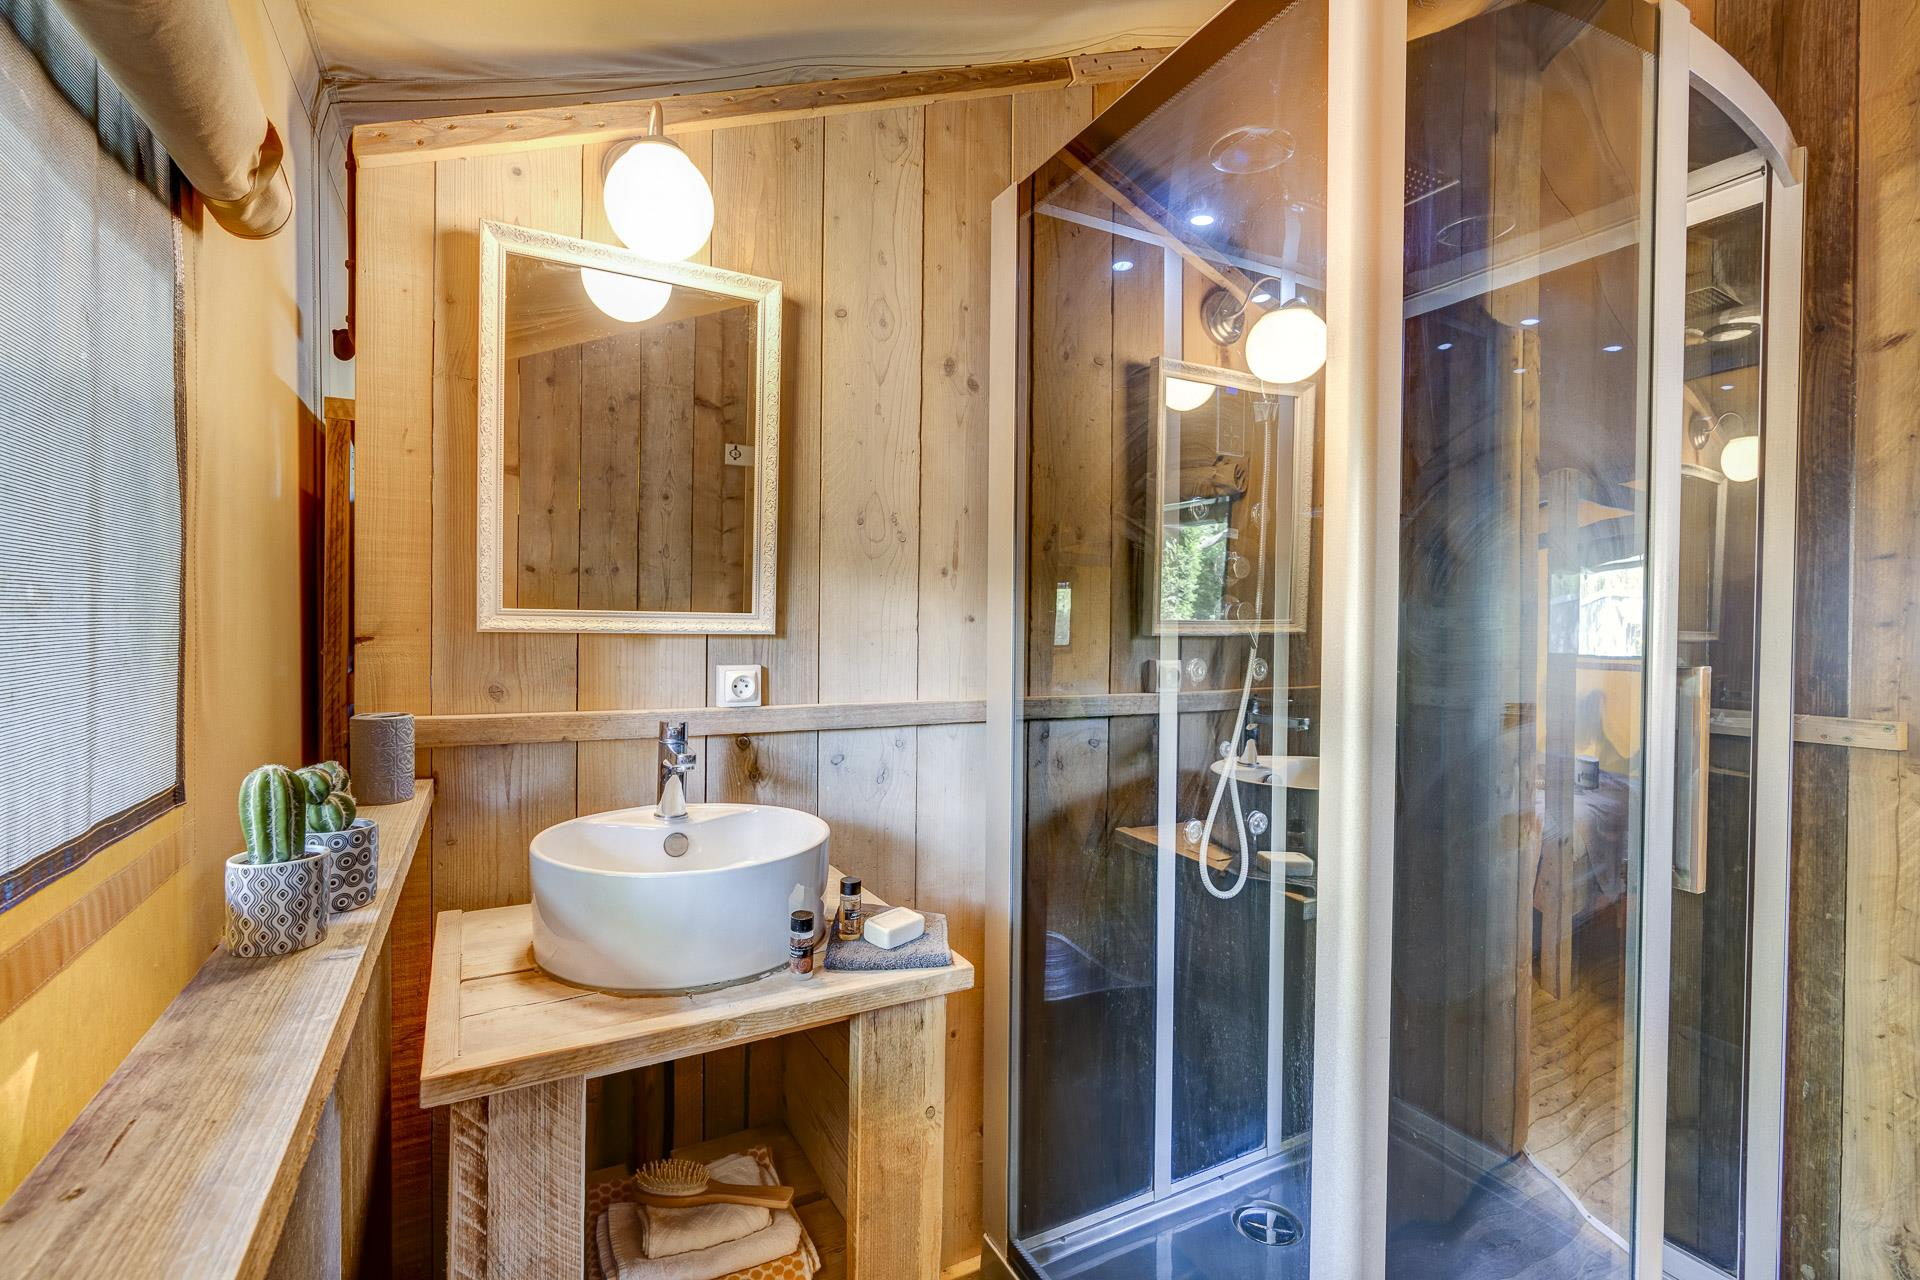 Location - Lodge Safari 2 Chambres **** - Camping Sandaya Séquoia Parc